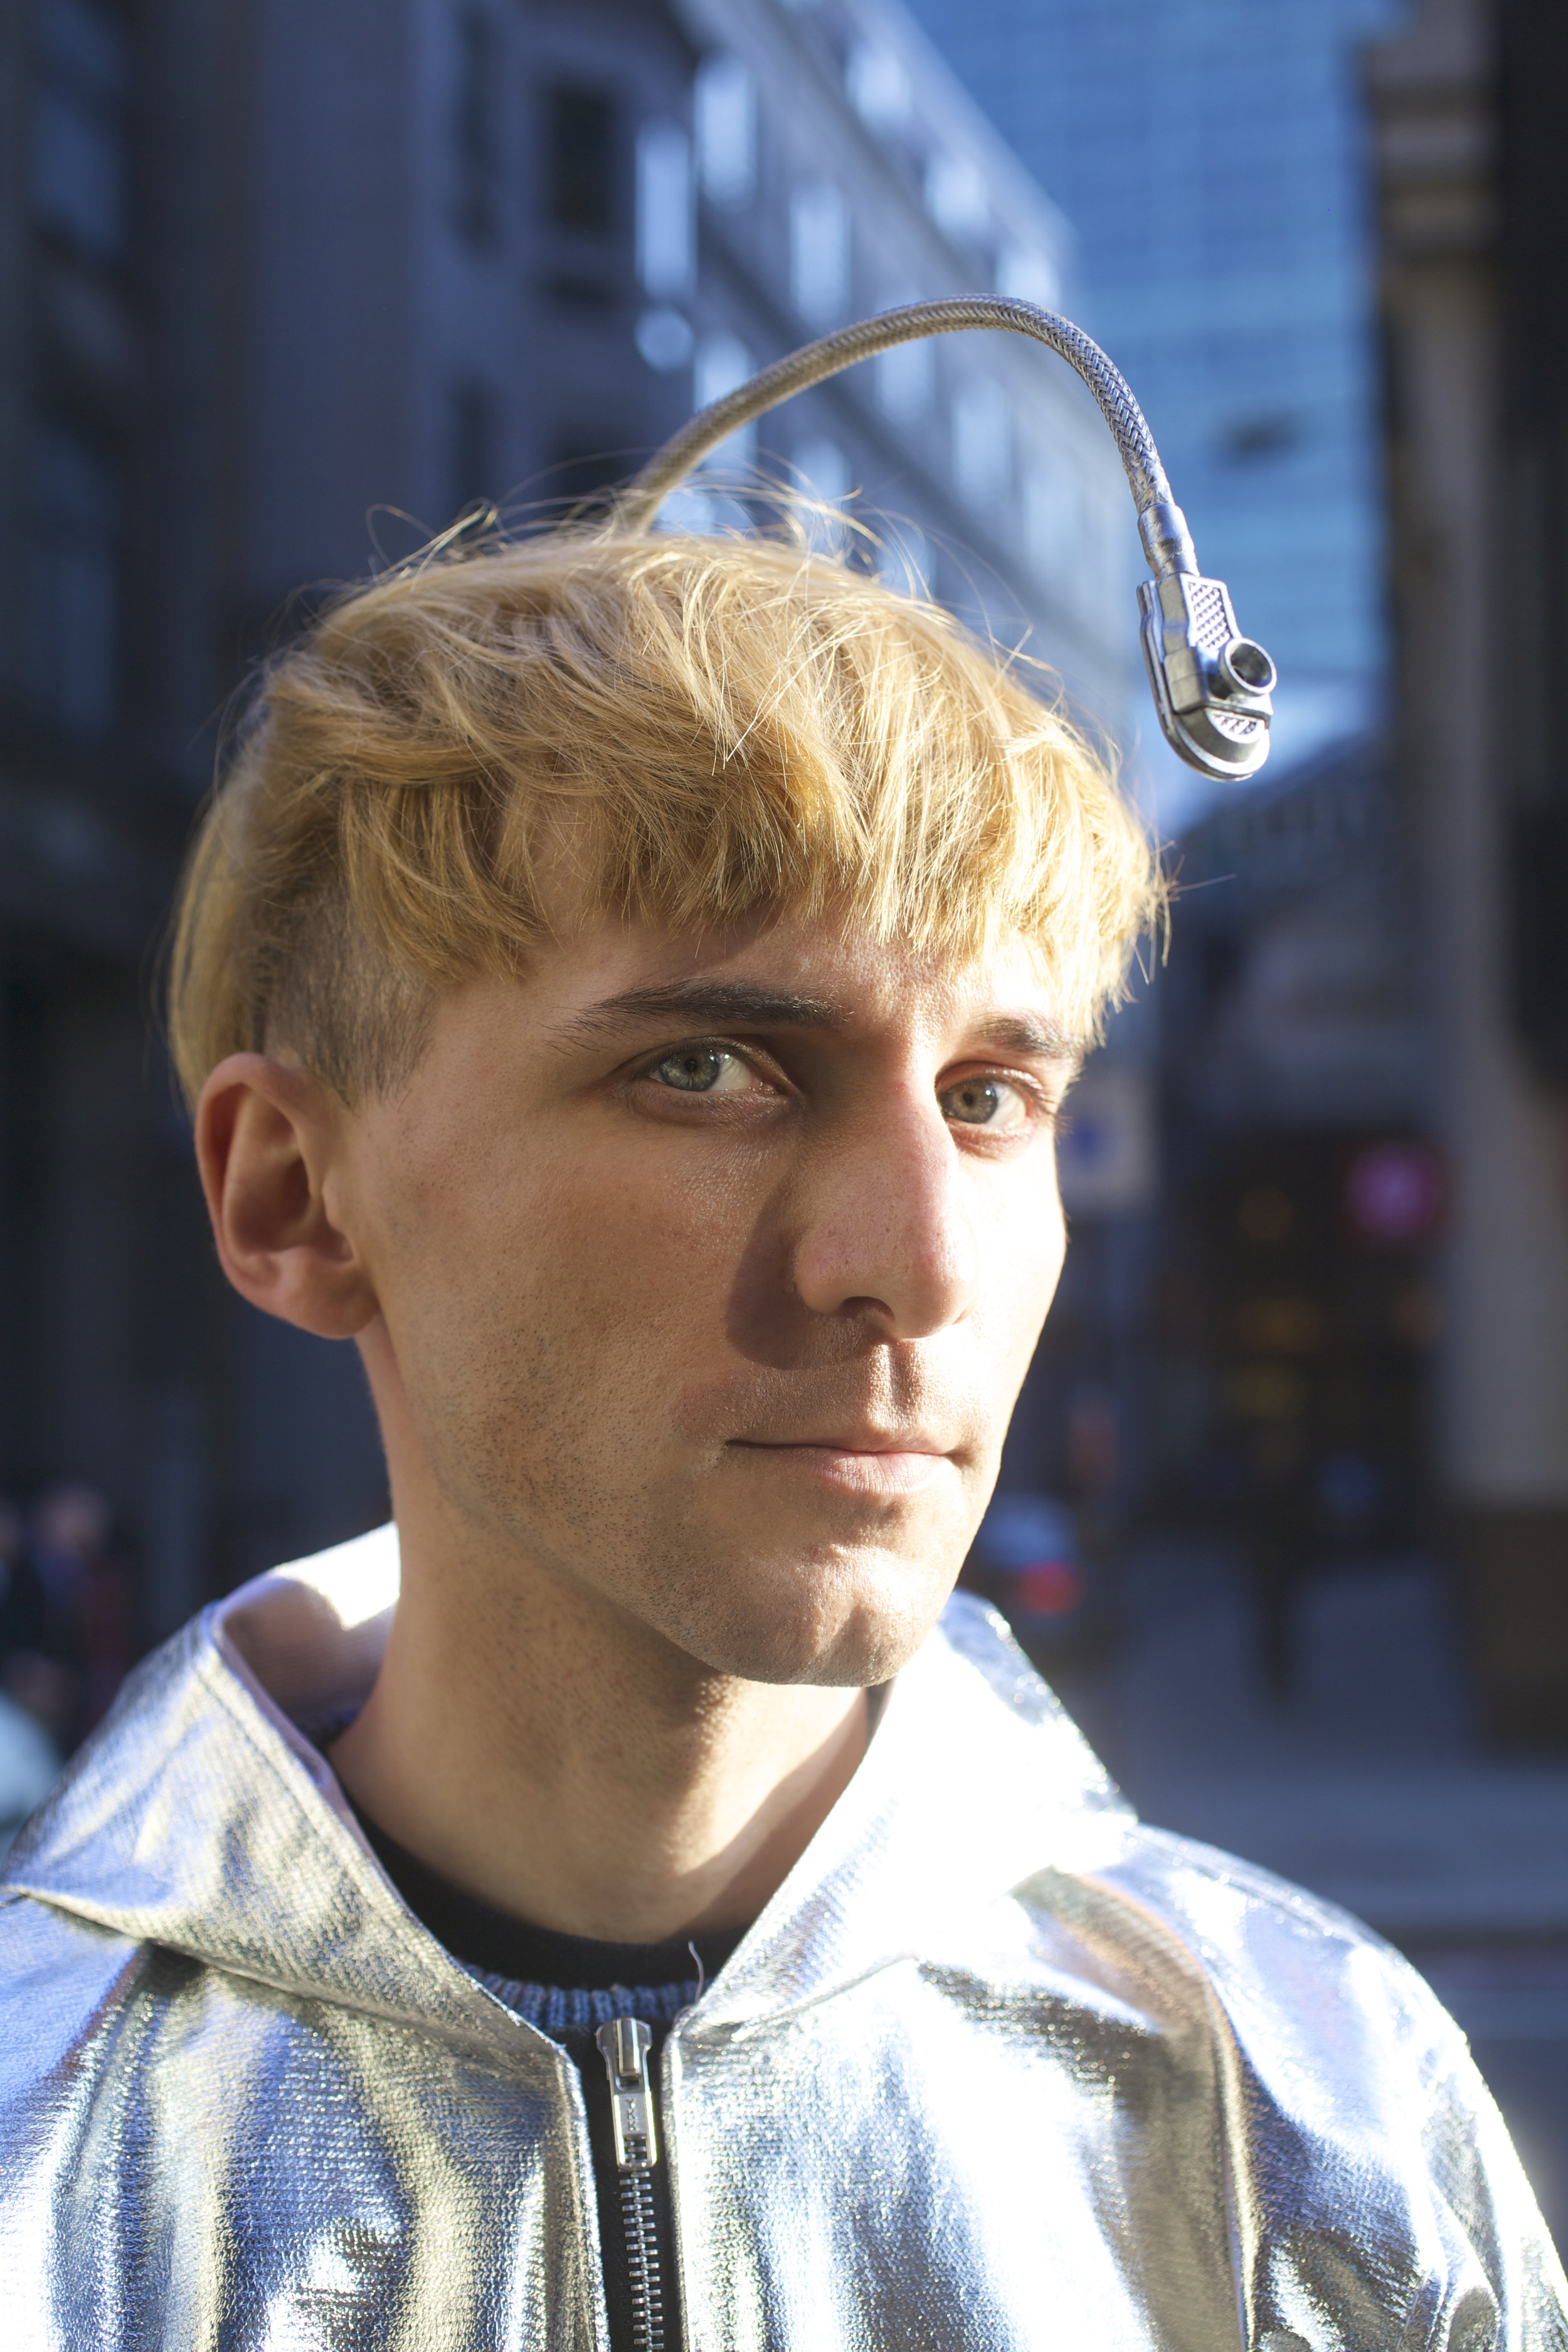 Neil Harbisson - World's First Cyborg & Transhumanist